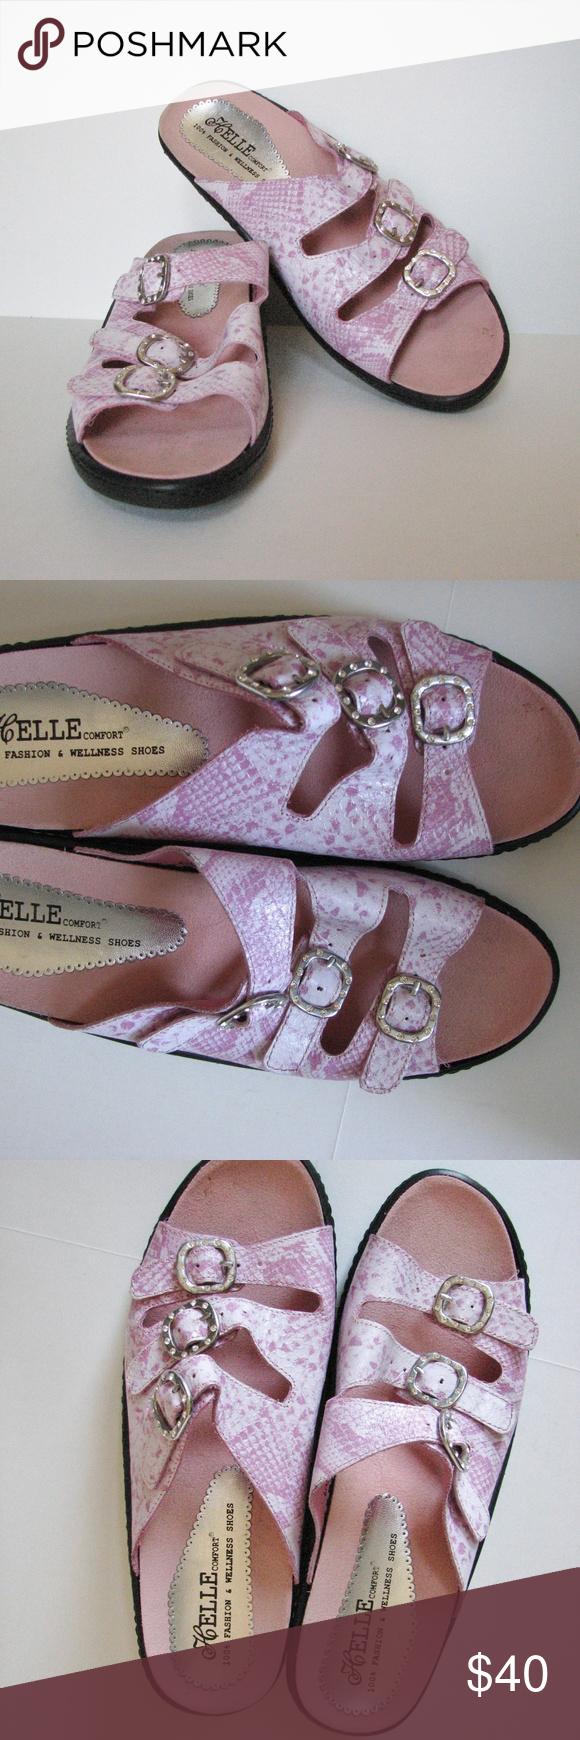 helle metallic shoes tula black free comfort combination sandals leather blk comforter